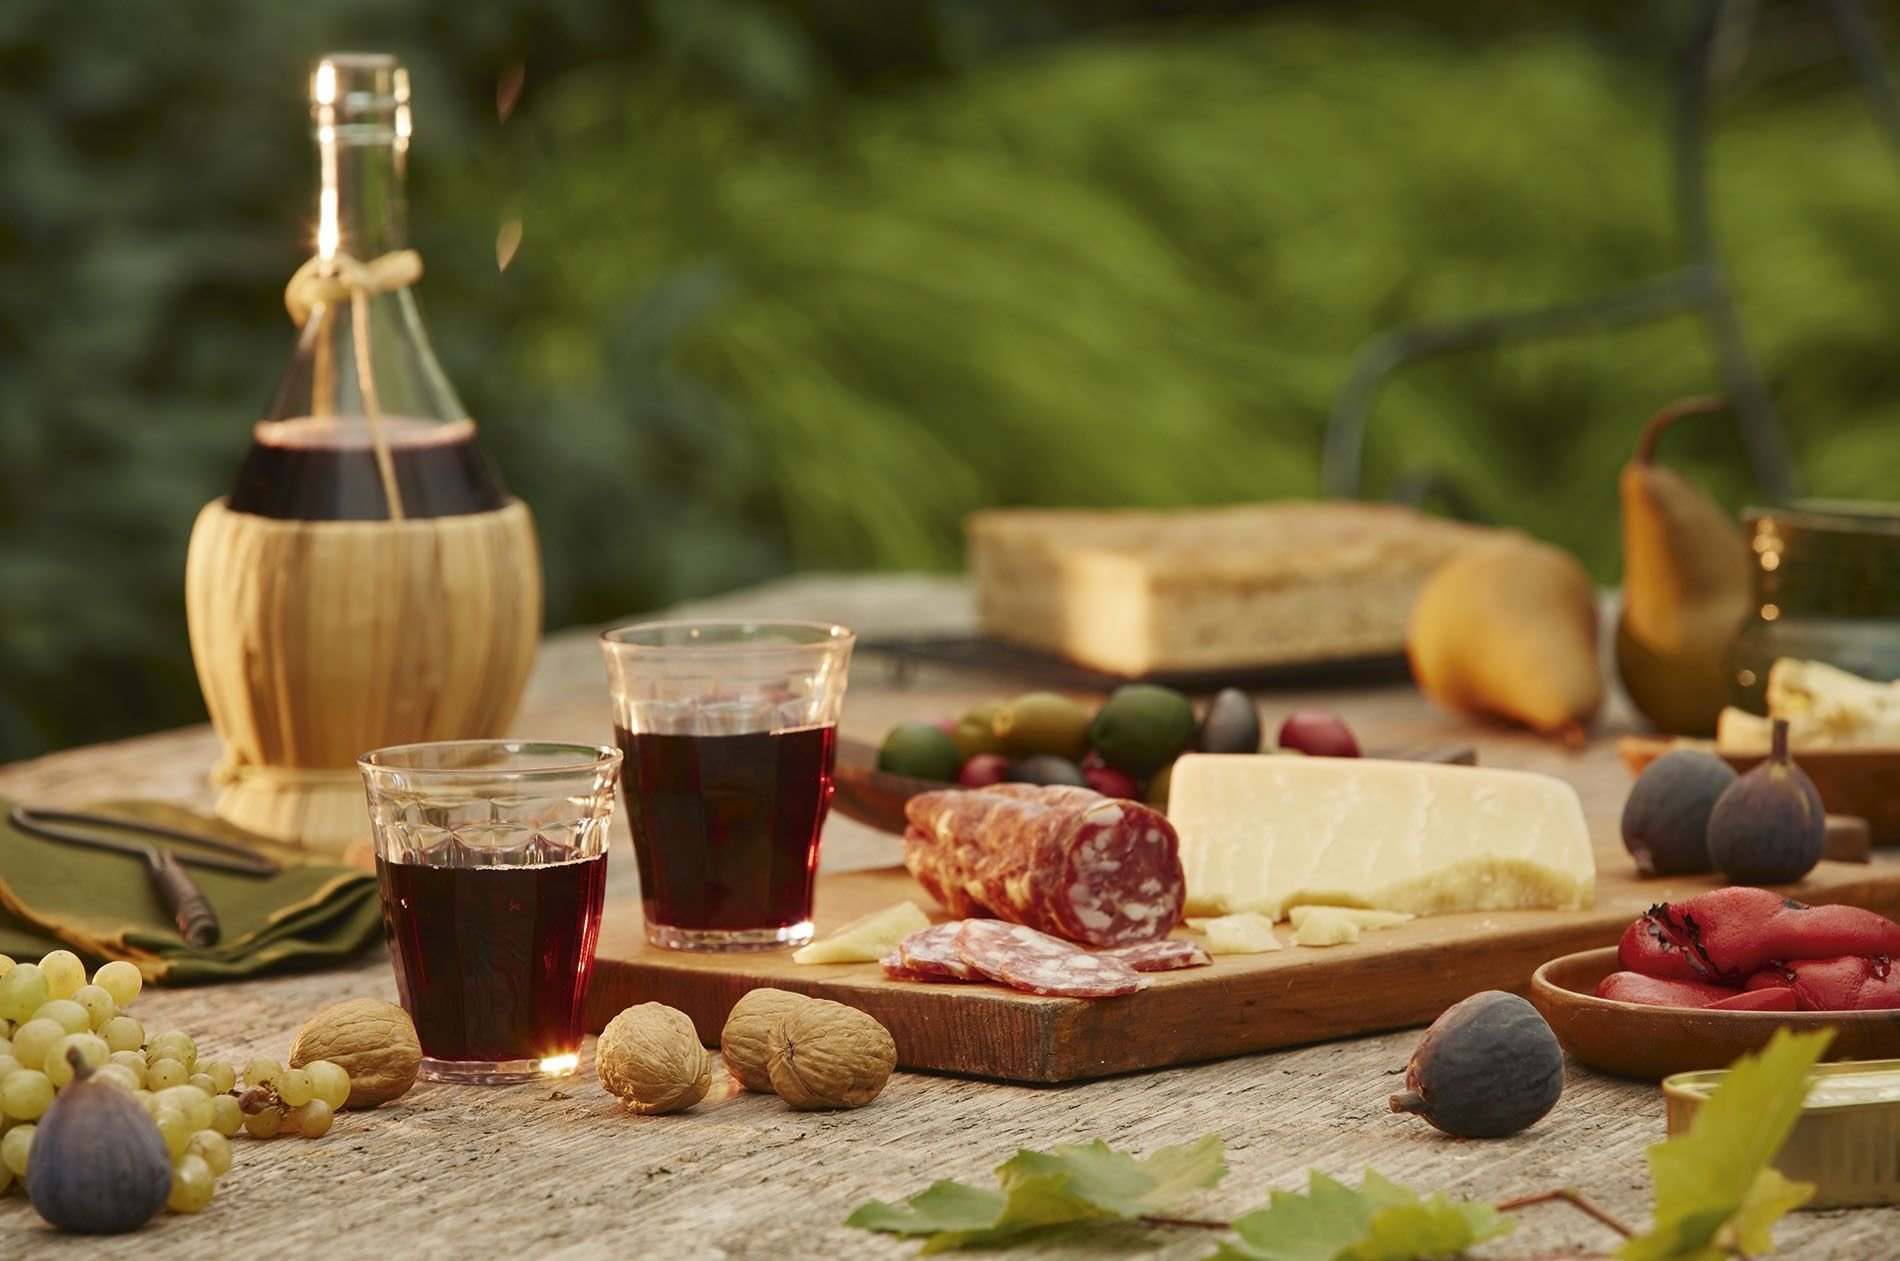 In her books, Emiko Davies celebrates Italian recipes